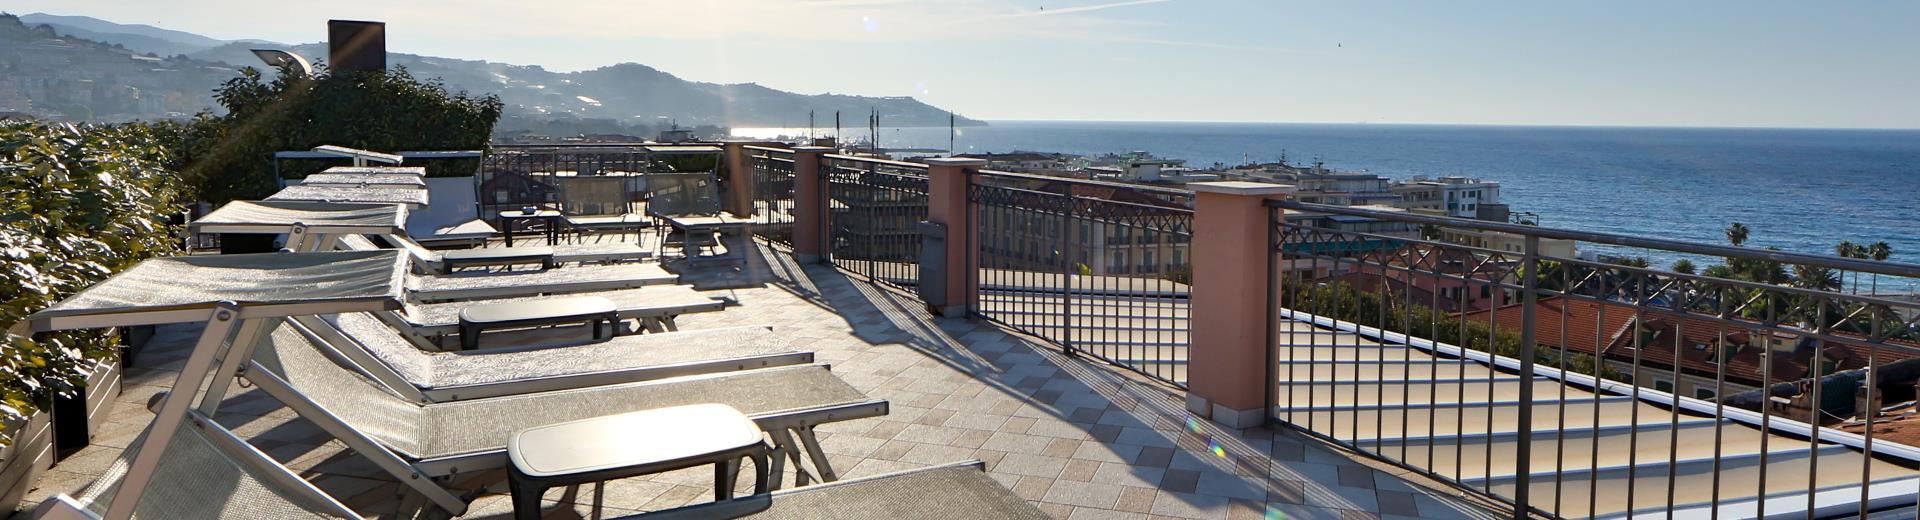 Hotel Sanremo 4 stelle  Best Western Hotel Nazionale